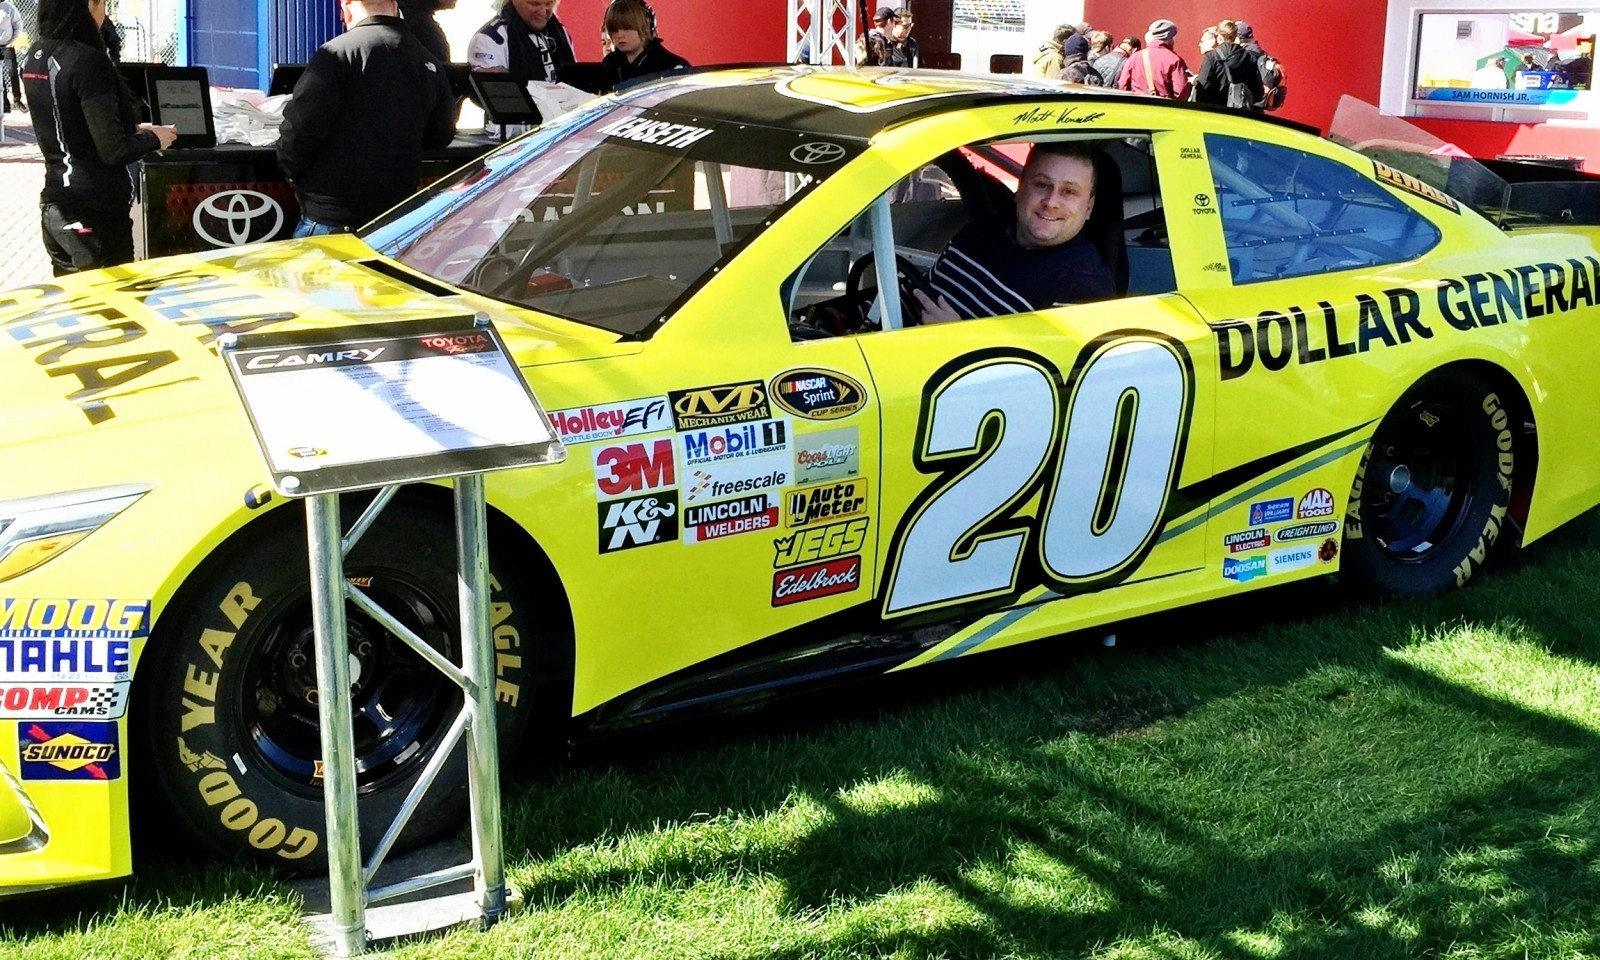 2015 Toyota Camry NASCAR Dollar General 7